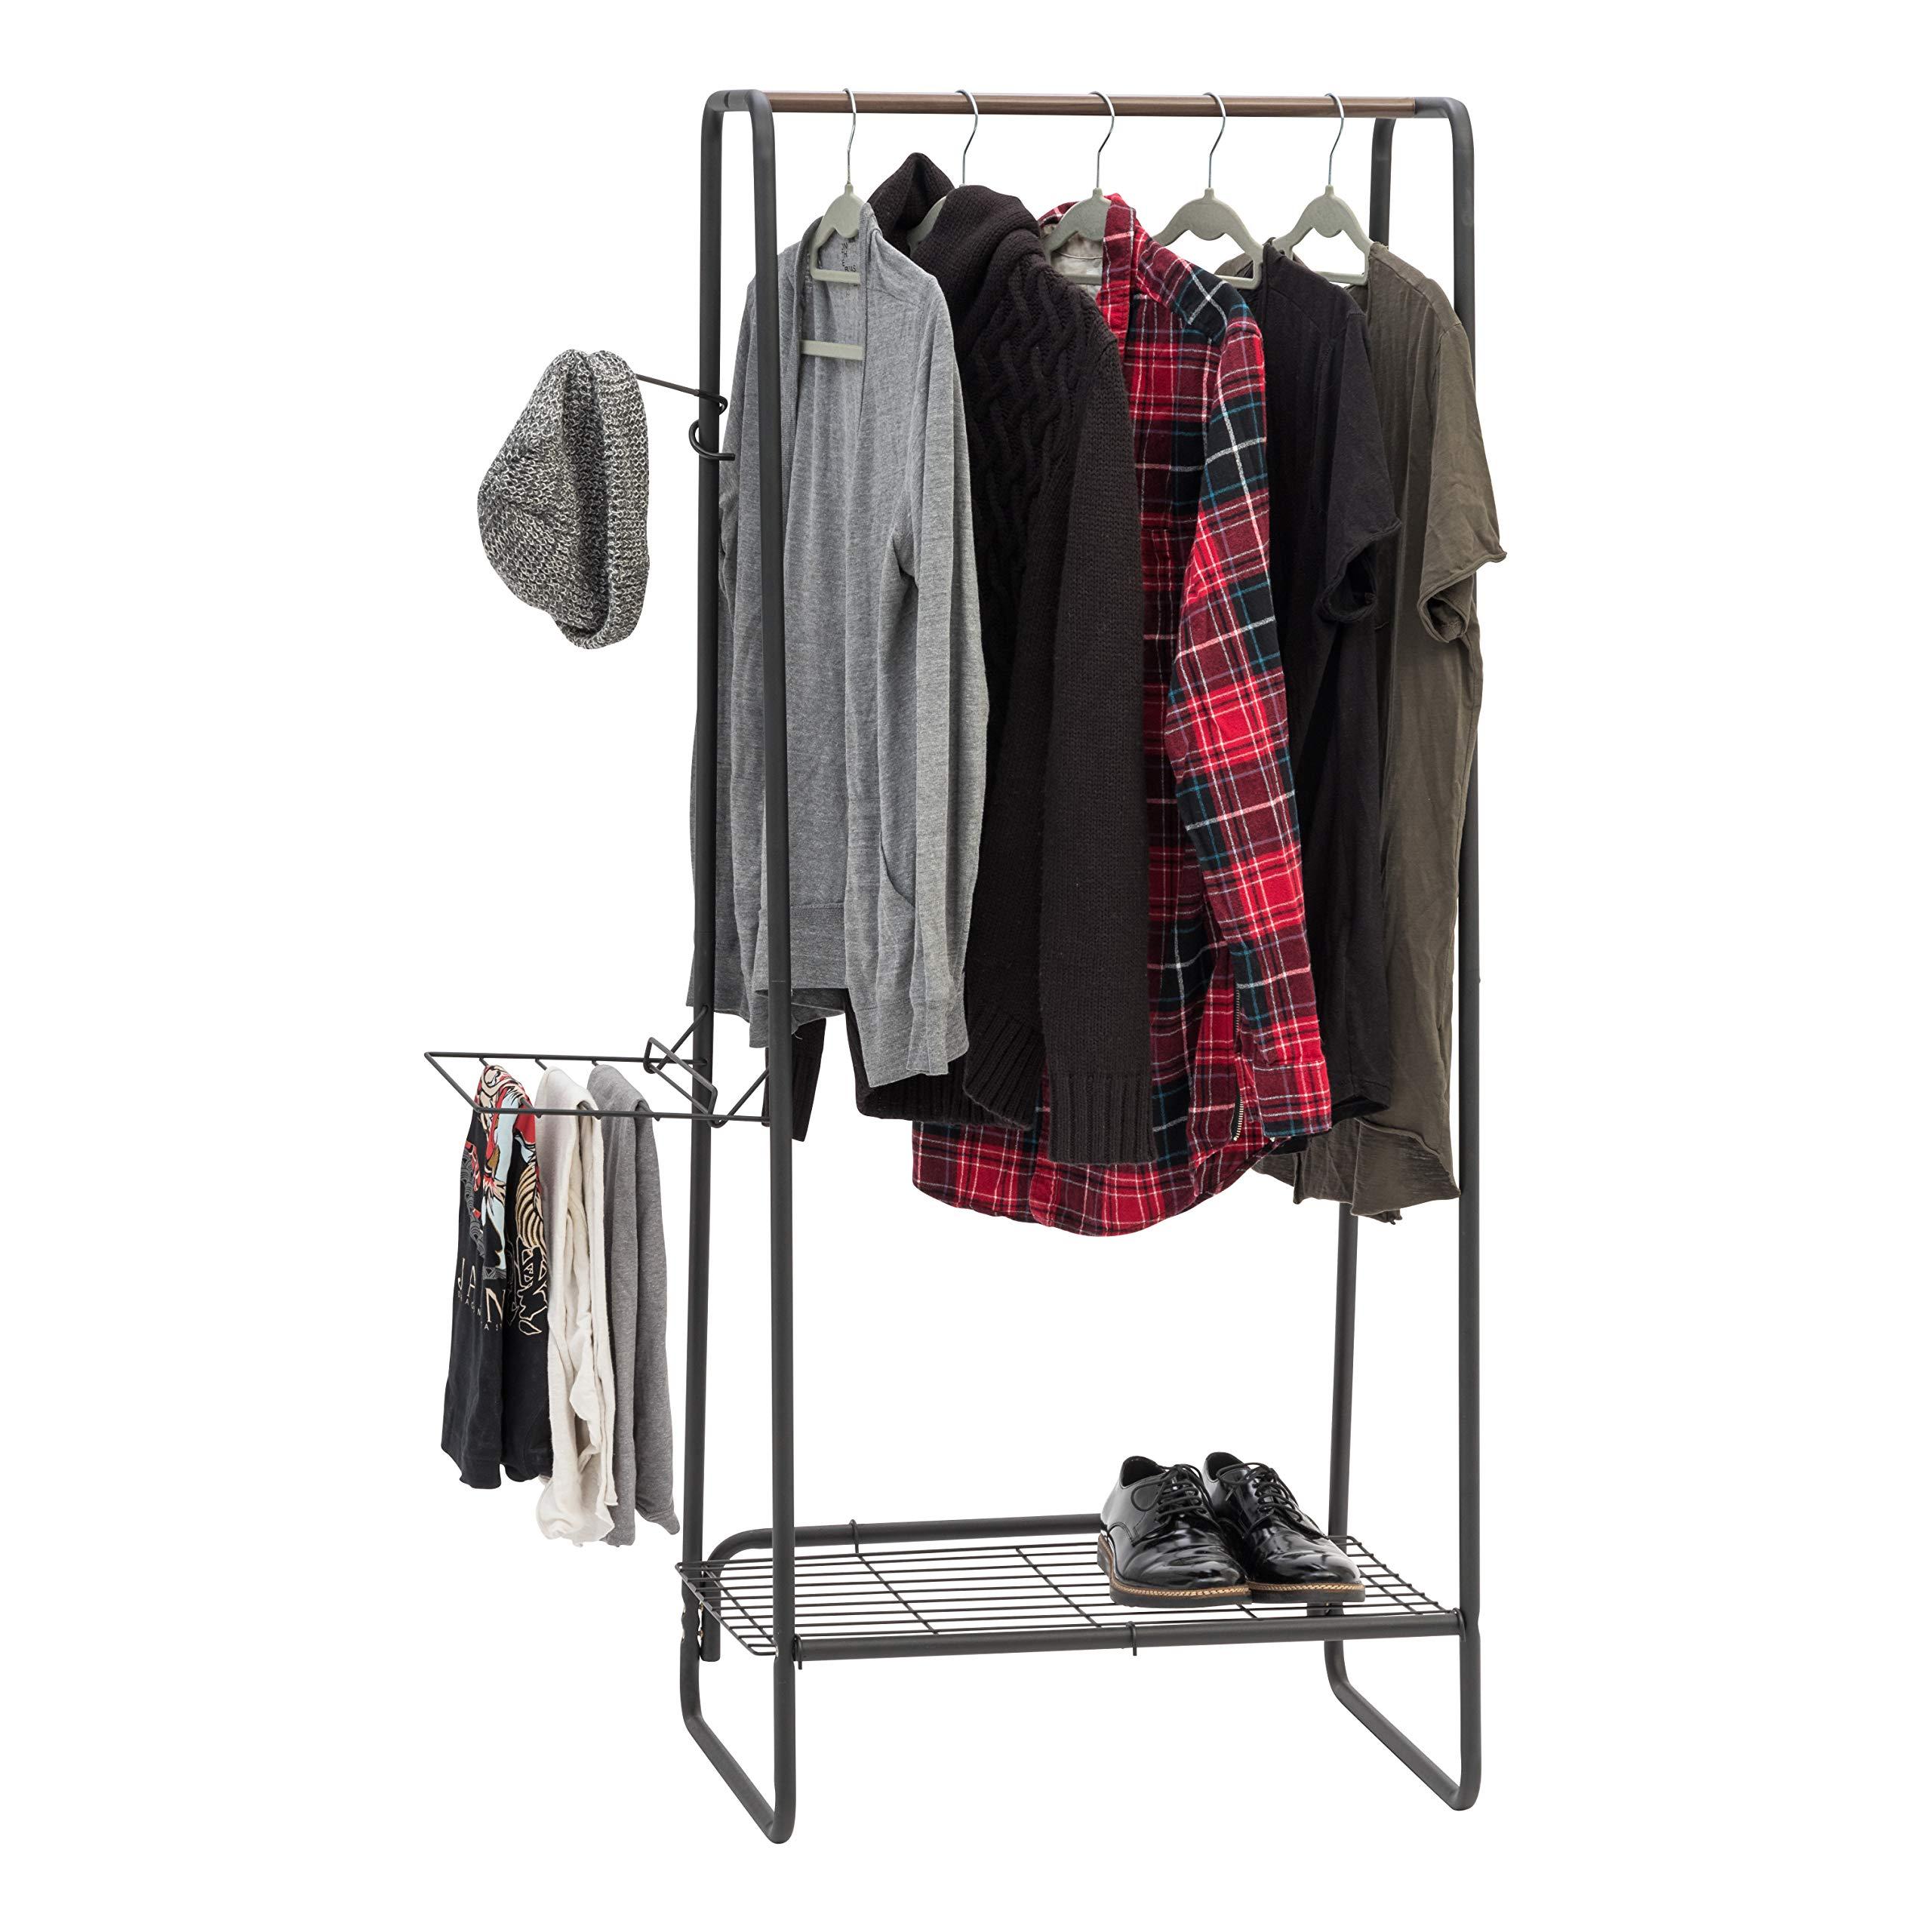 "IRIS Black Metal Garment & Accessories Rack: Medium (25.2"" W) $26.19 + Free Shipping"